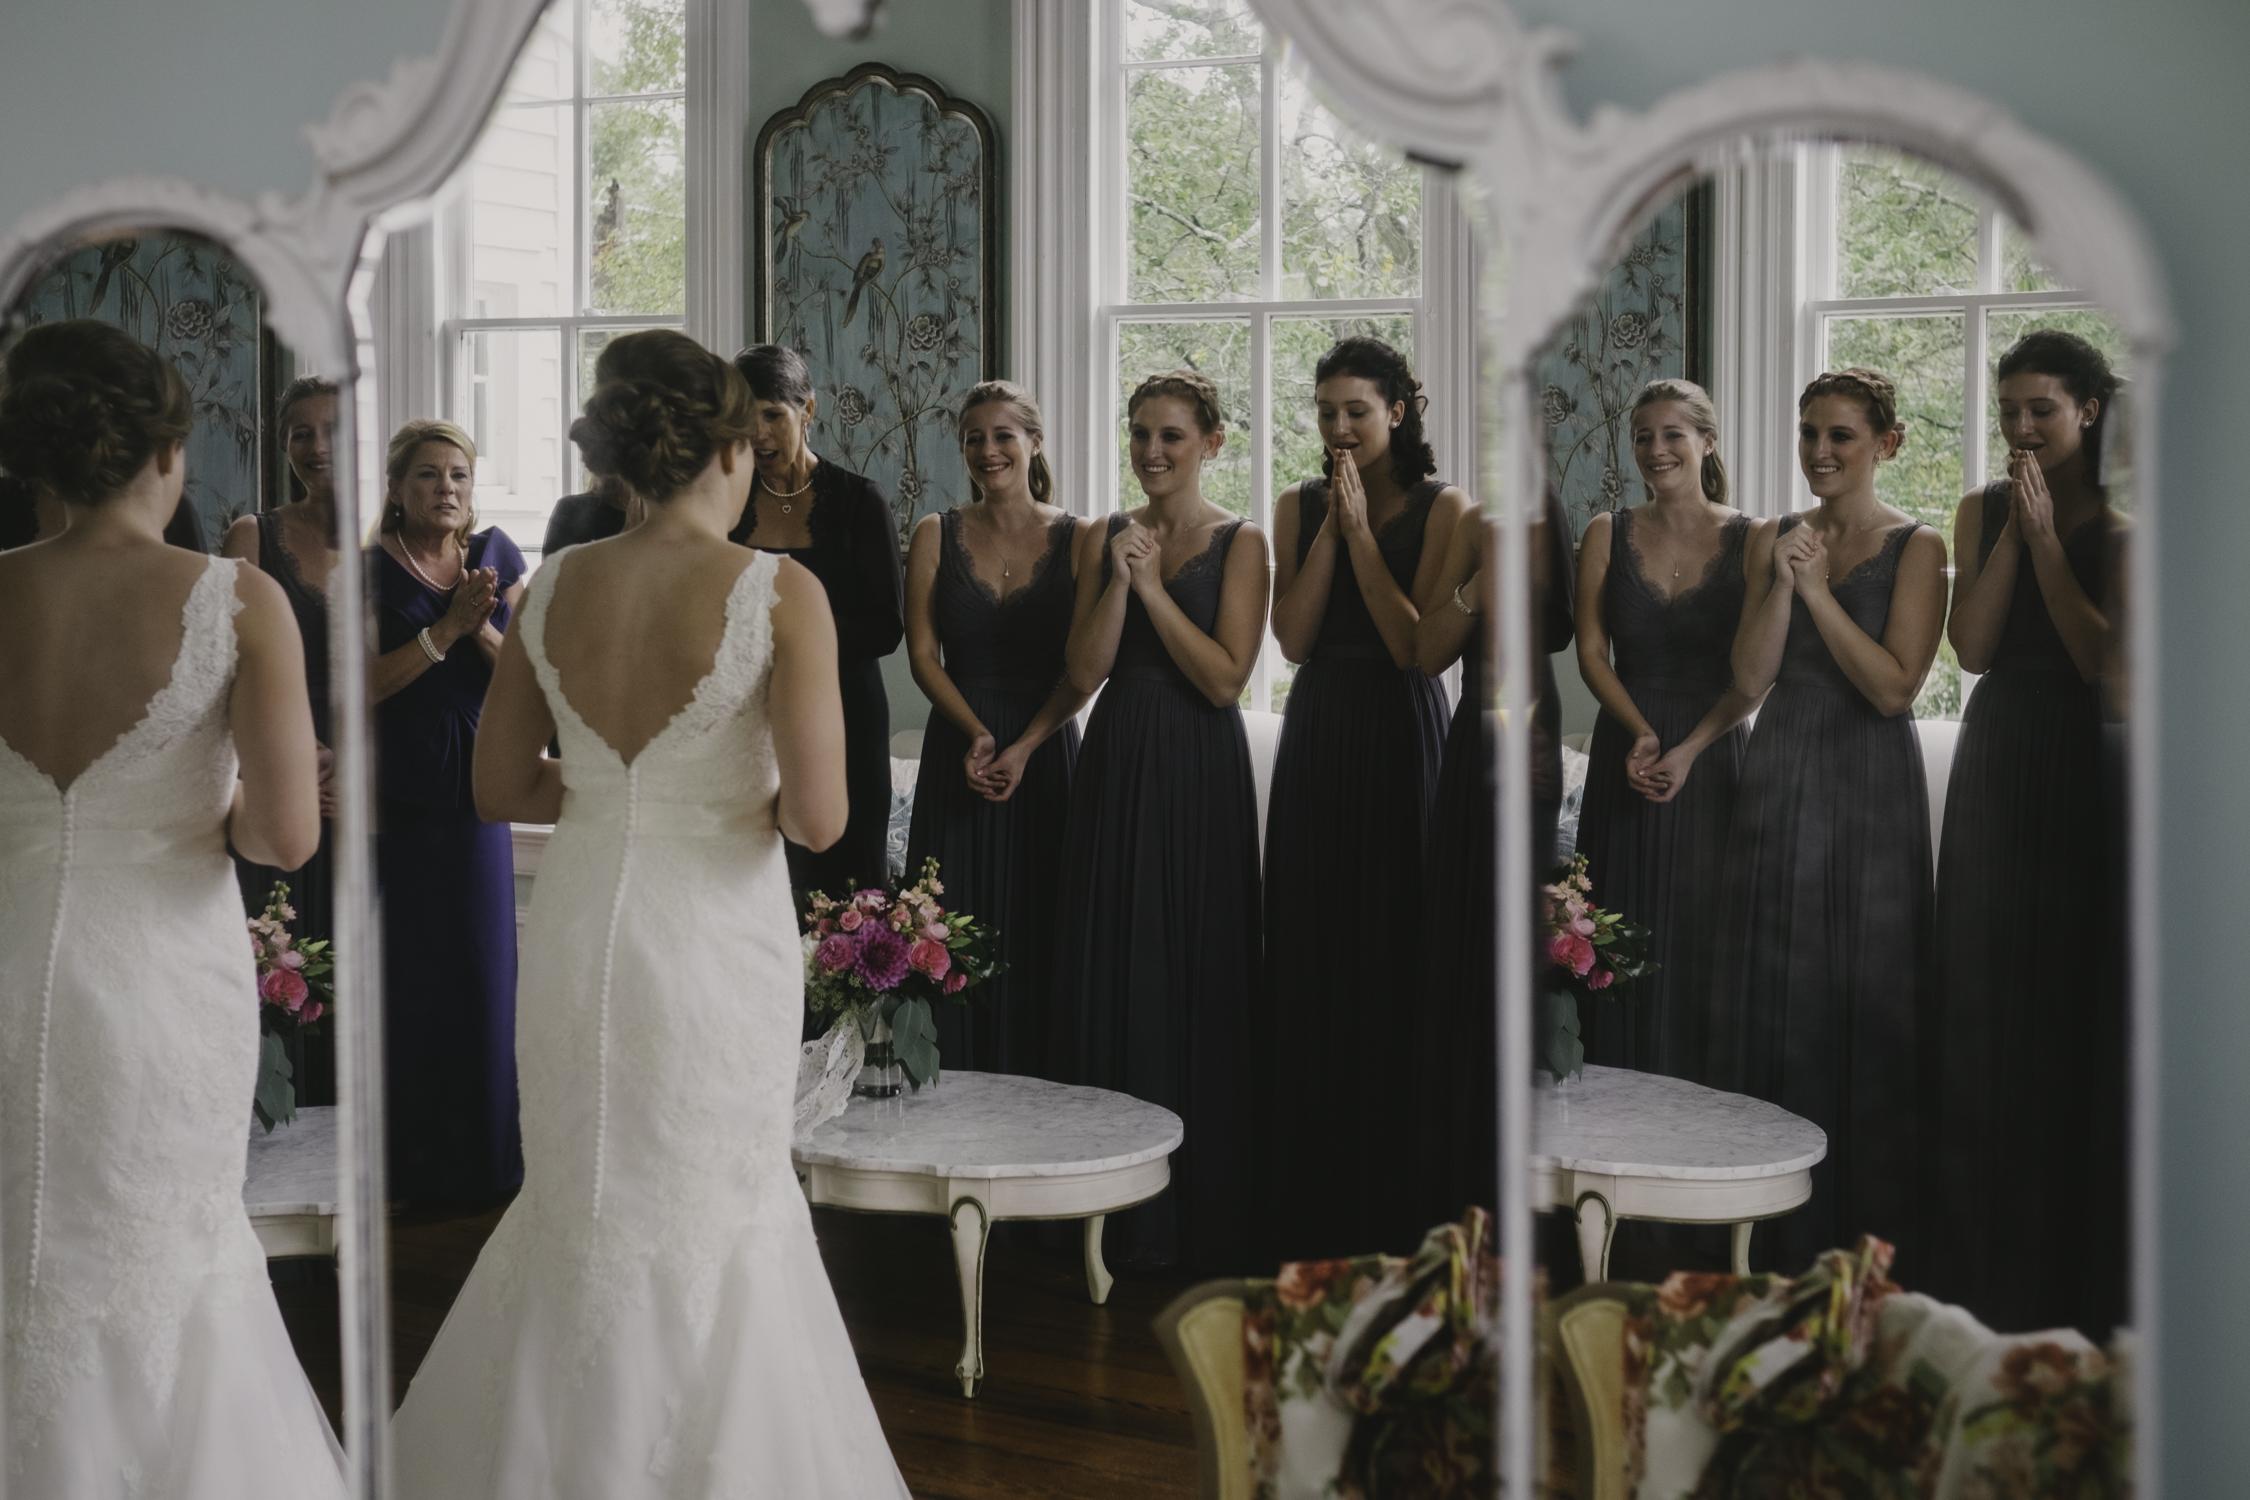 merrimon wynne bridale suit dress reveal